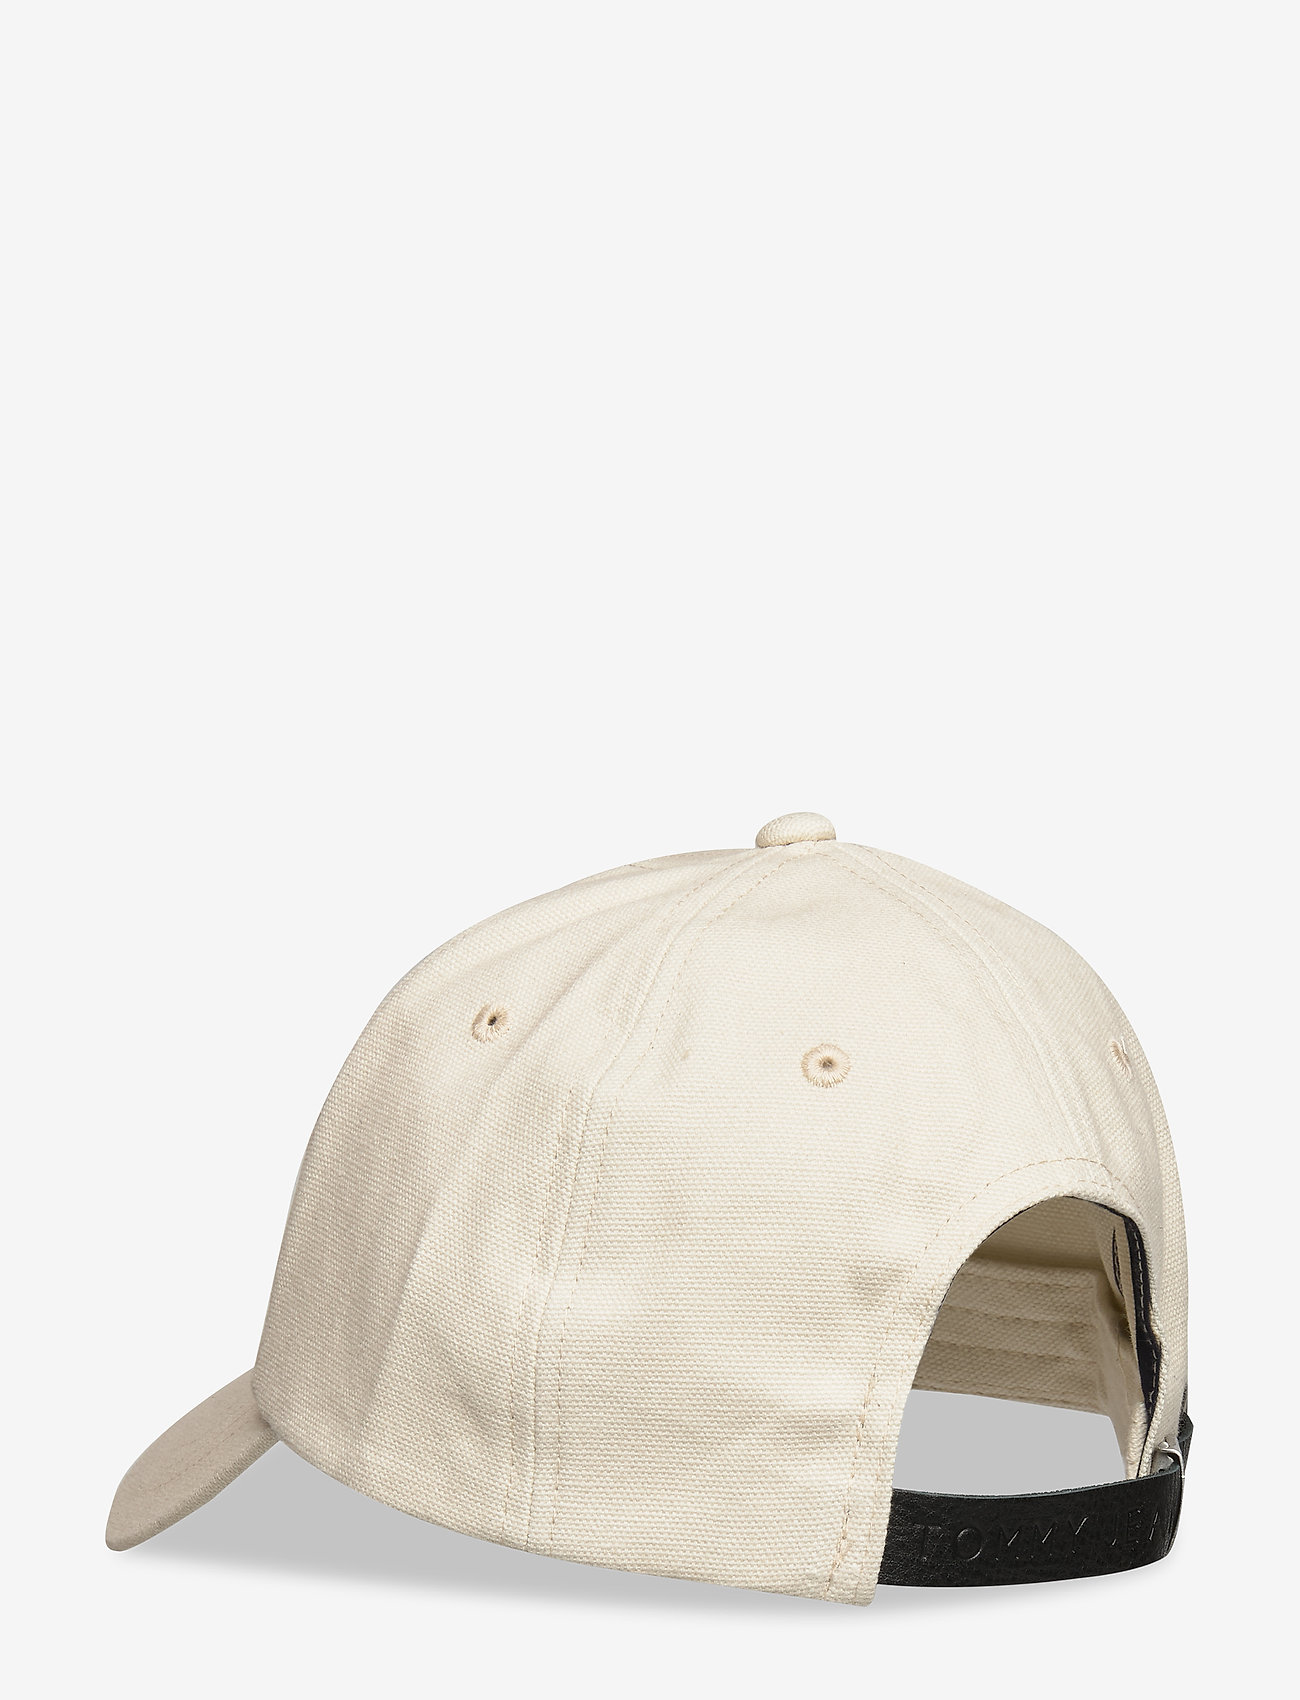 Tommy Hilfiger - TJM HERITAGE CAP - casquettes - desert tan - 1